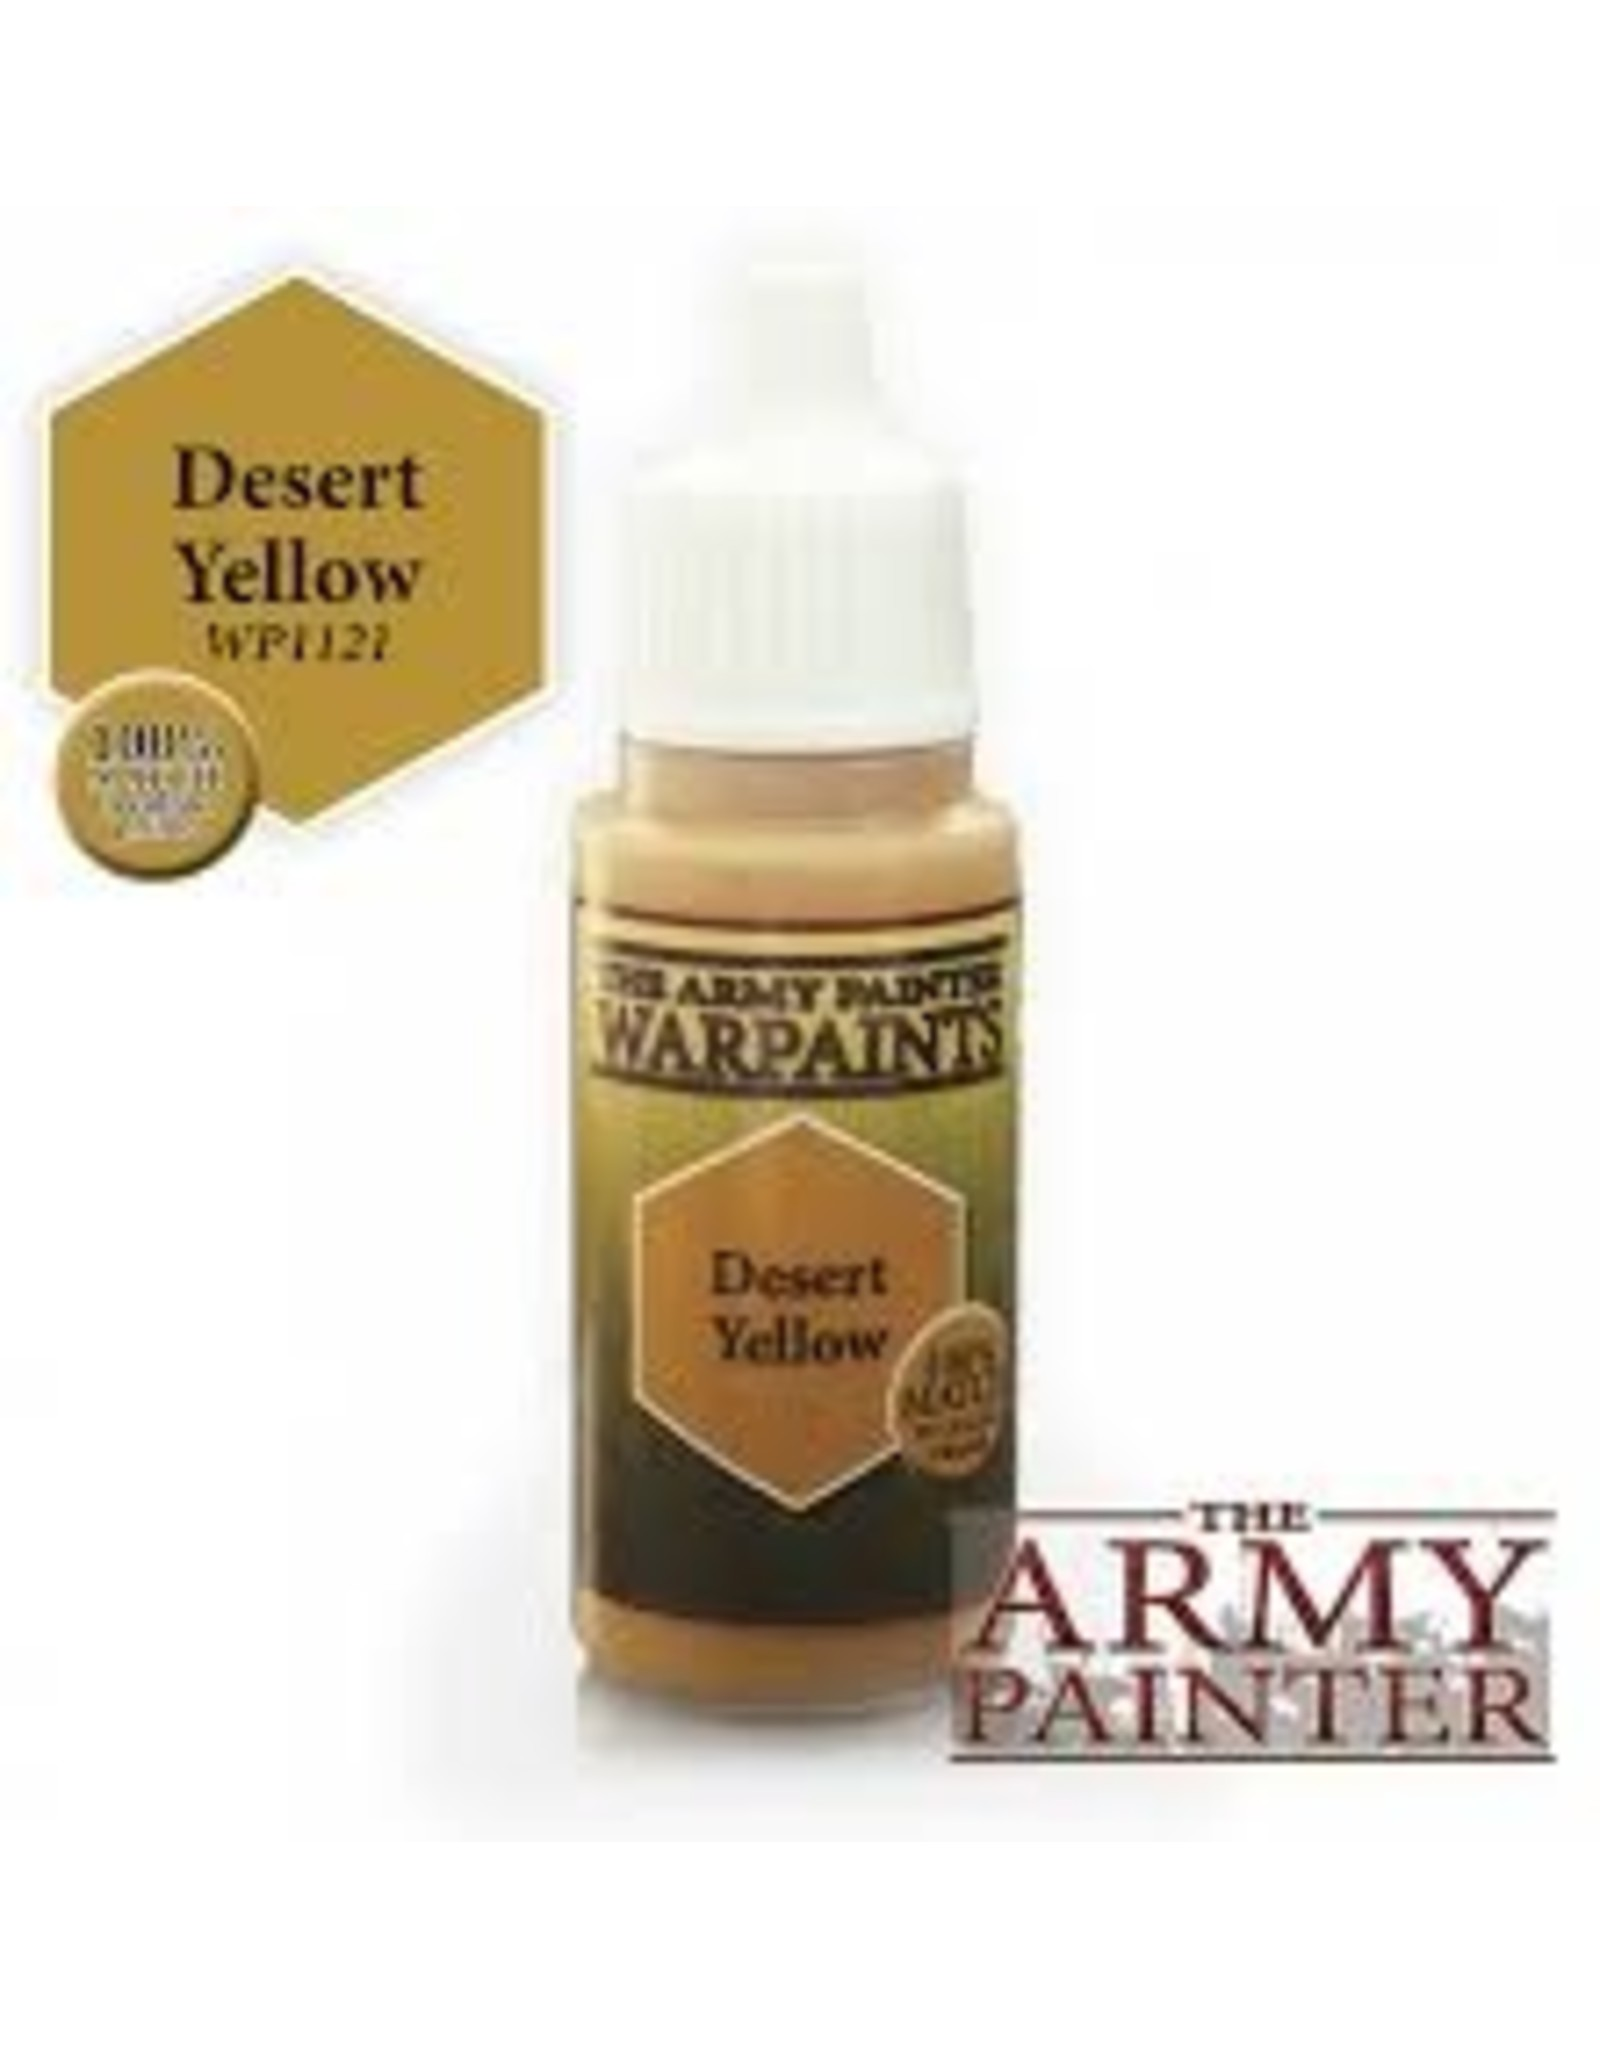 Army Painter Army Painter: Desert Yellow